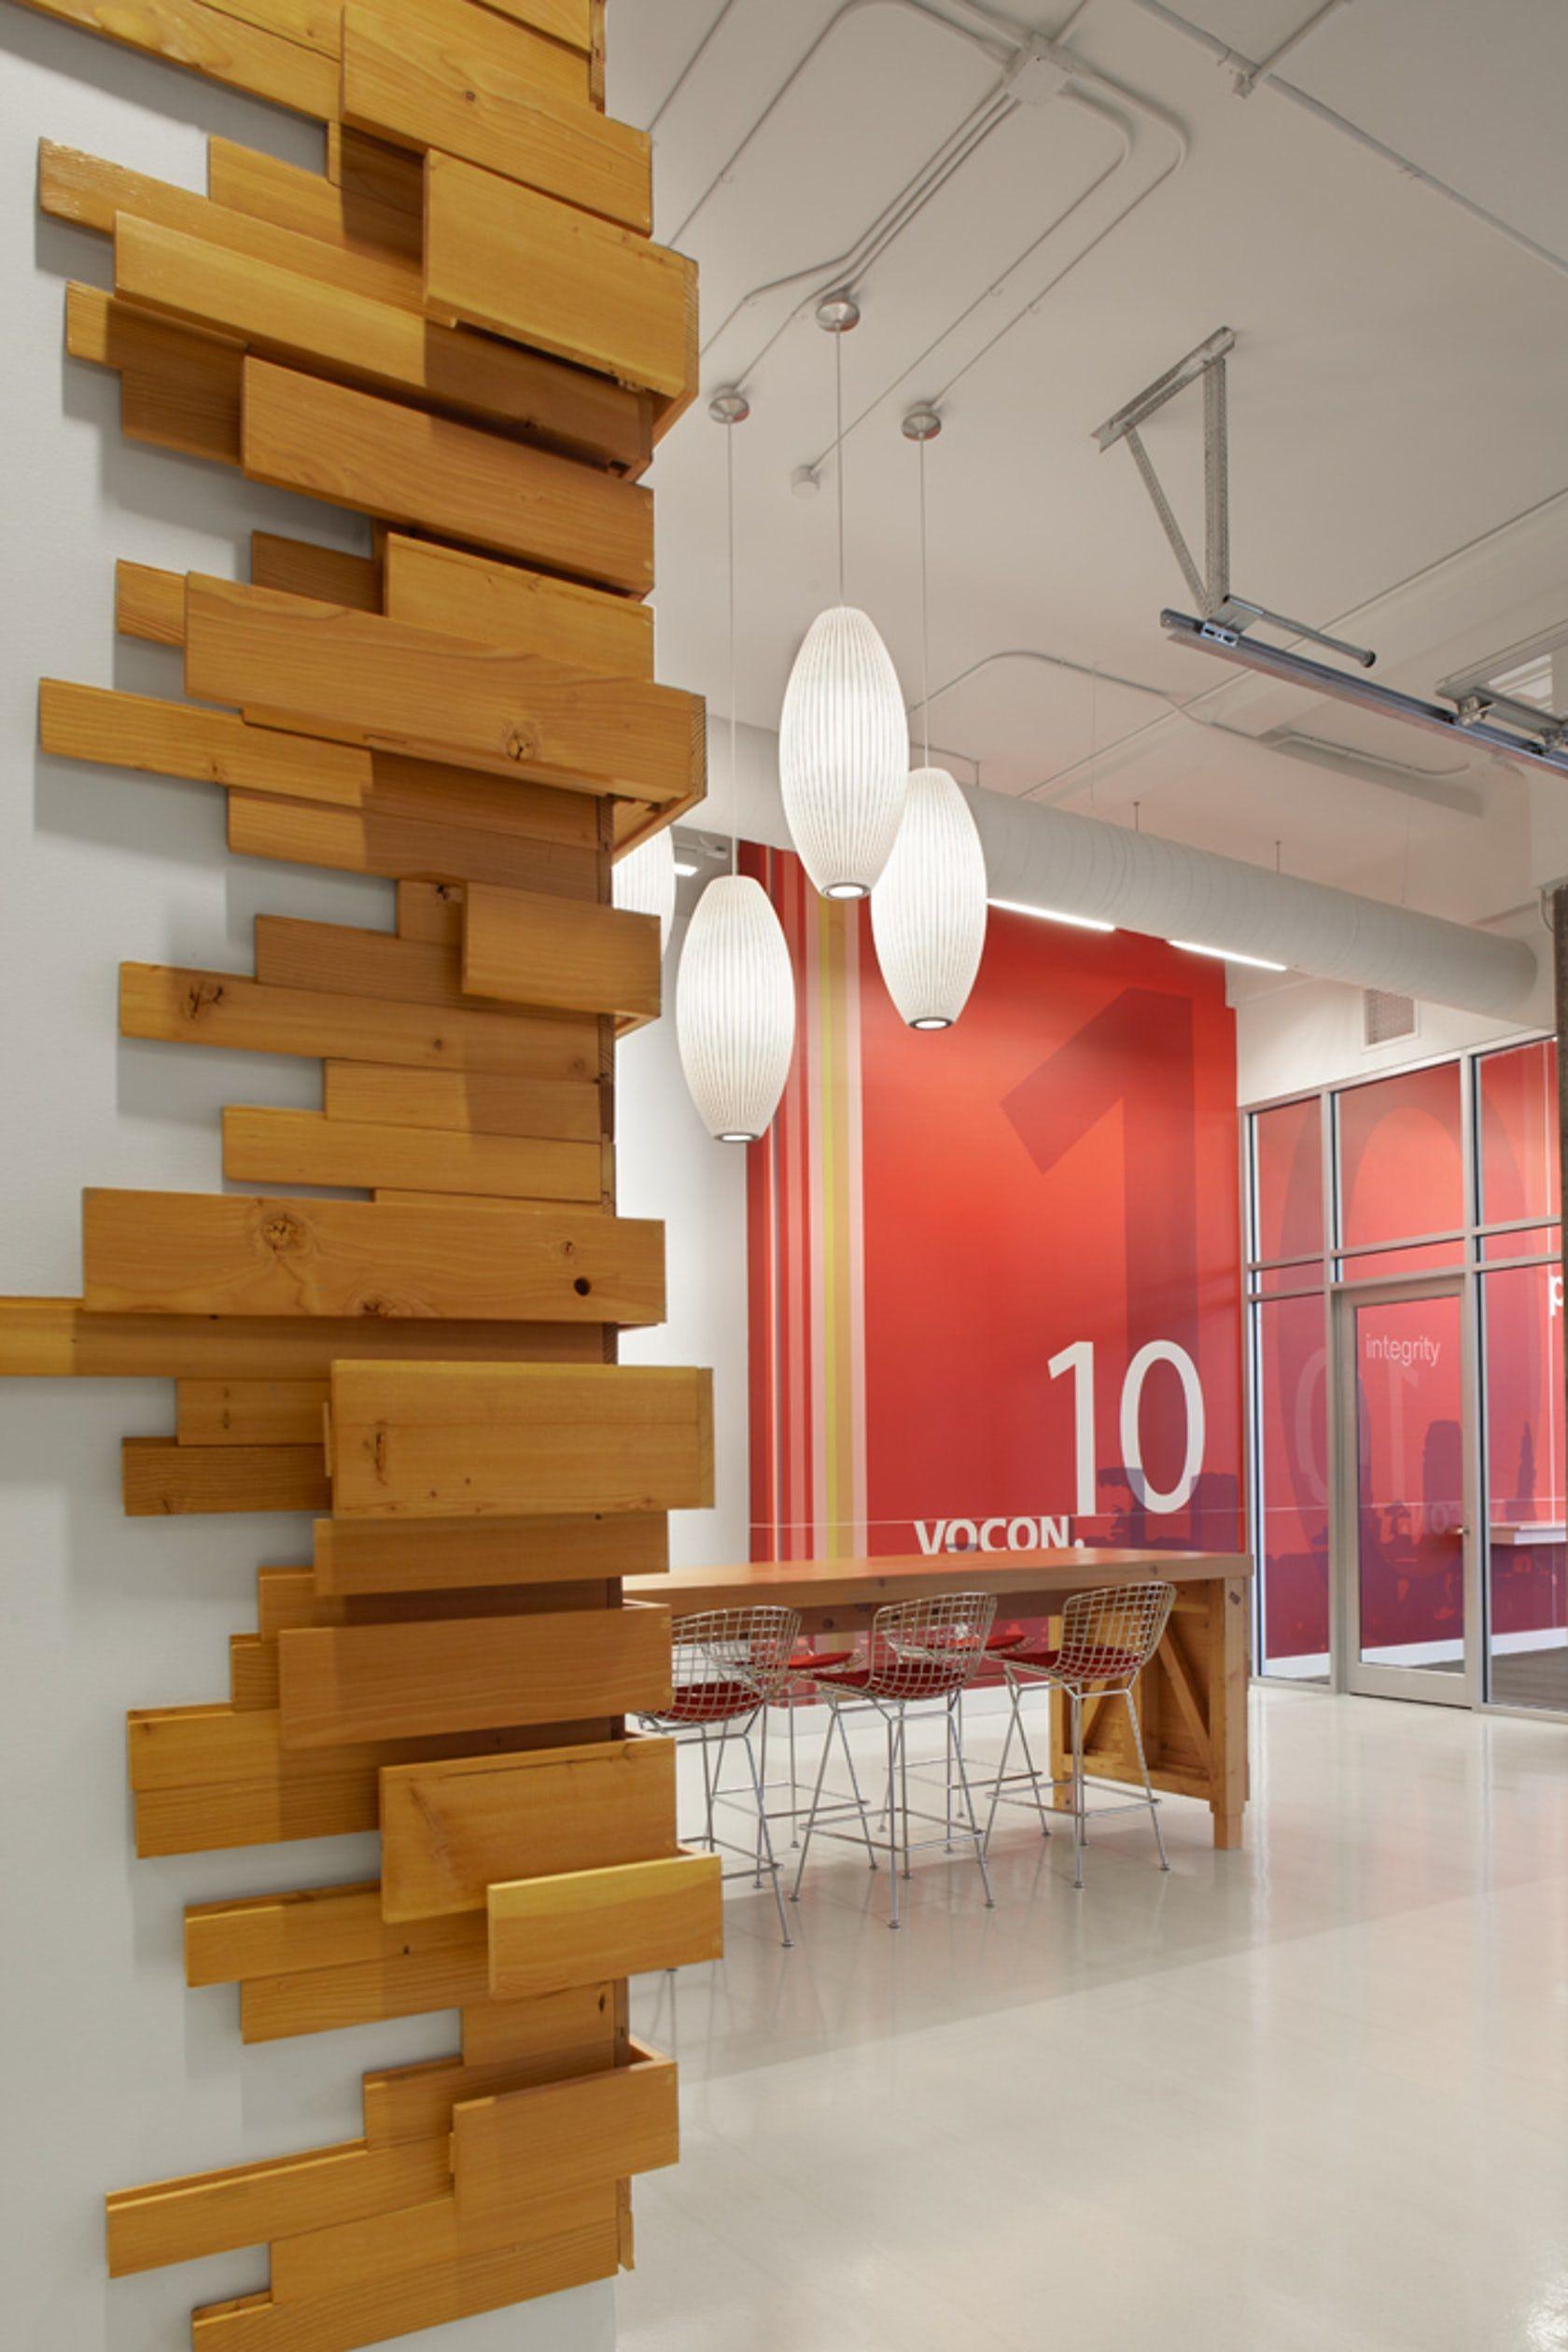 Image Result For Vocon Cleveland Interior Design